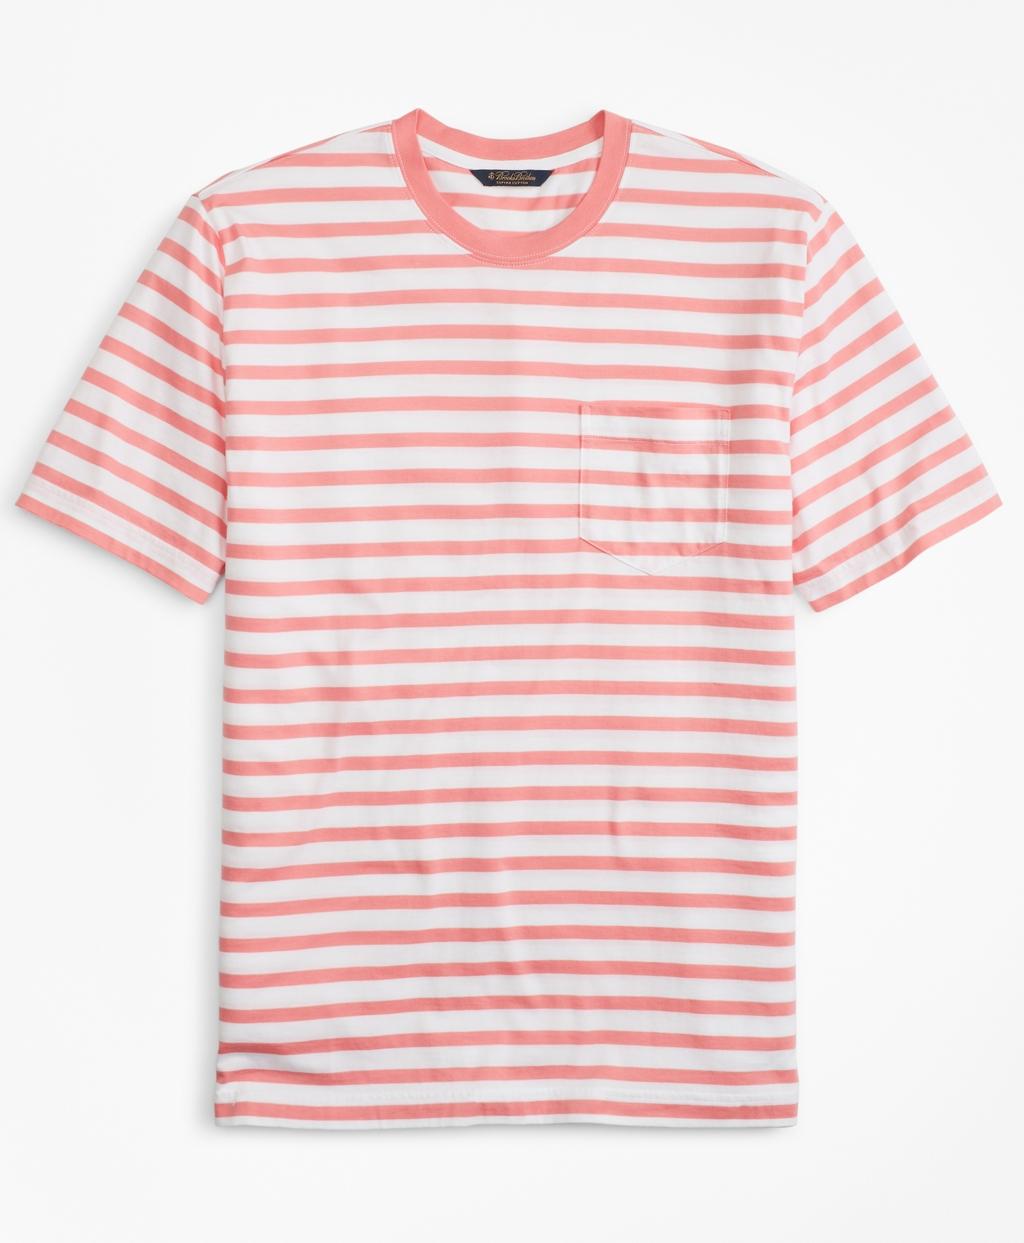 1930s Mens Shirts | Dress Shirts, Polo Shirts, Work Shirts Brooks Brothers Mens Supima Cotton Stripe T-Shirt $49.50 AT vintagedancer.com